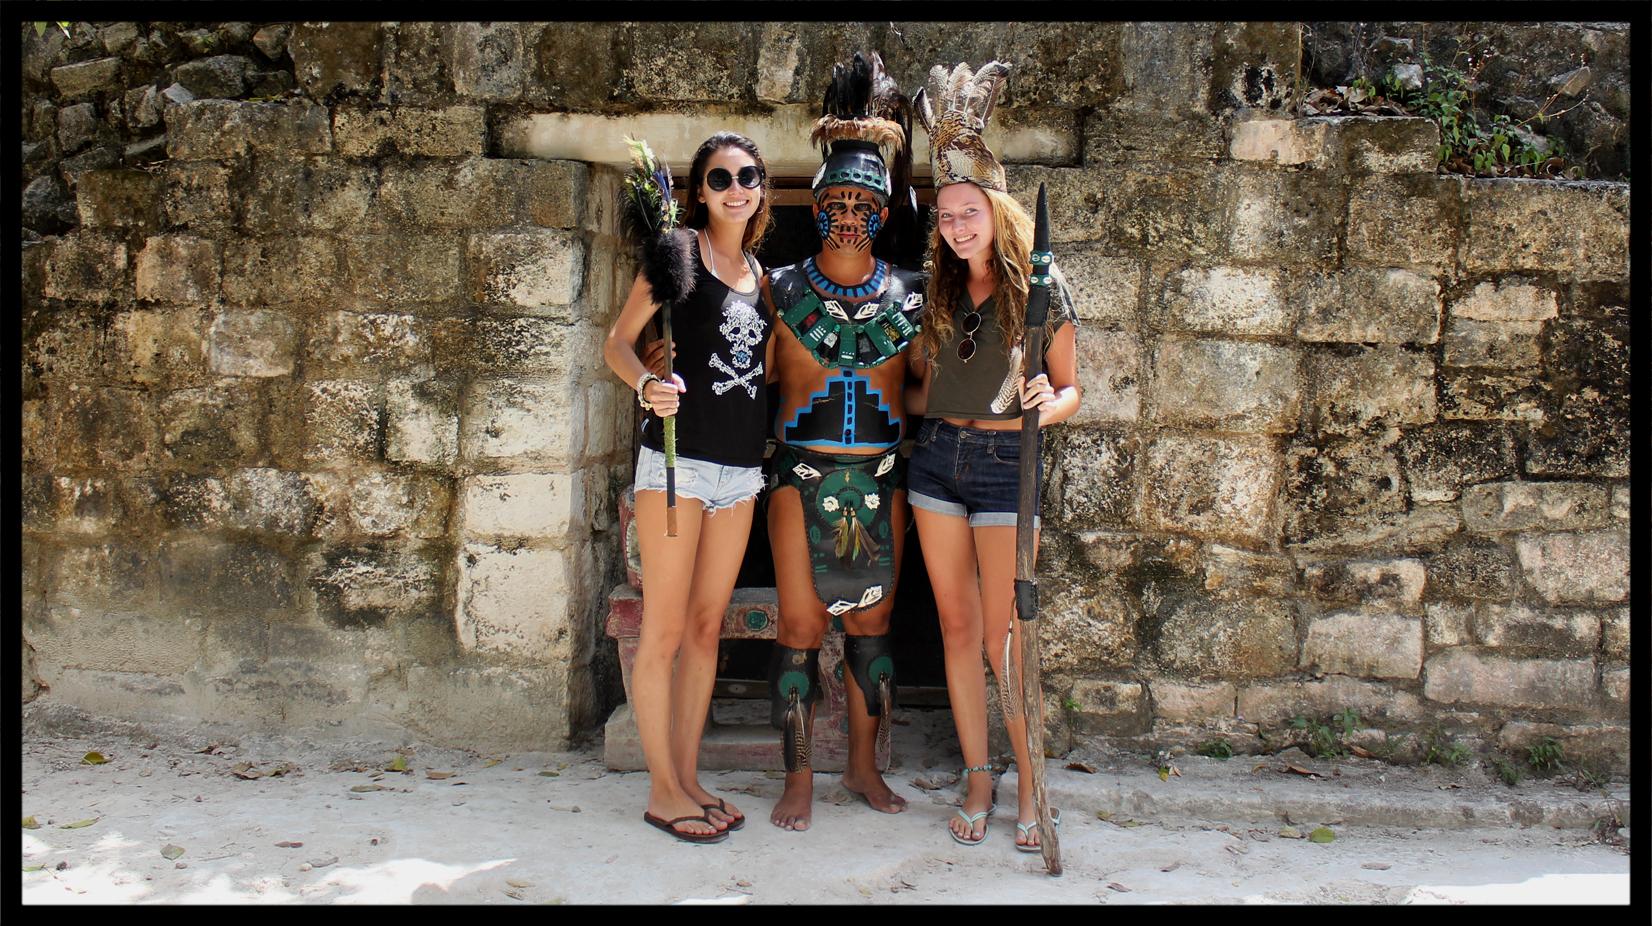 tourist_girls.jpg